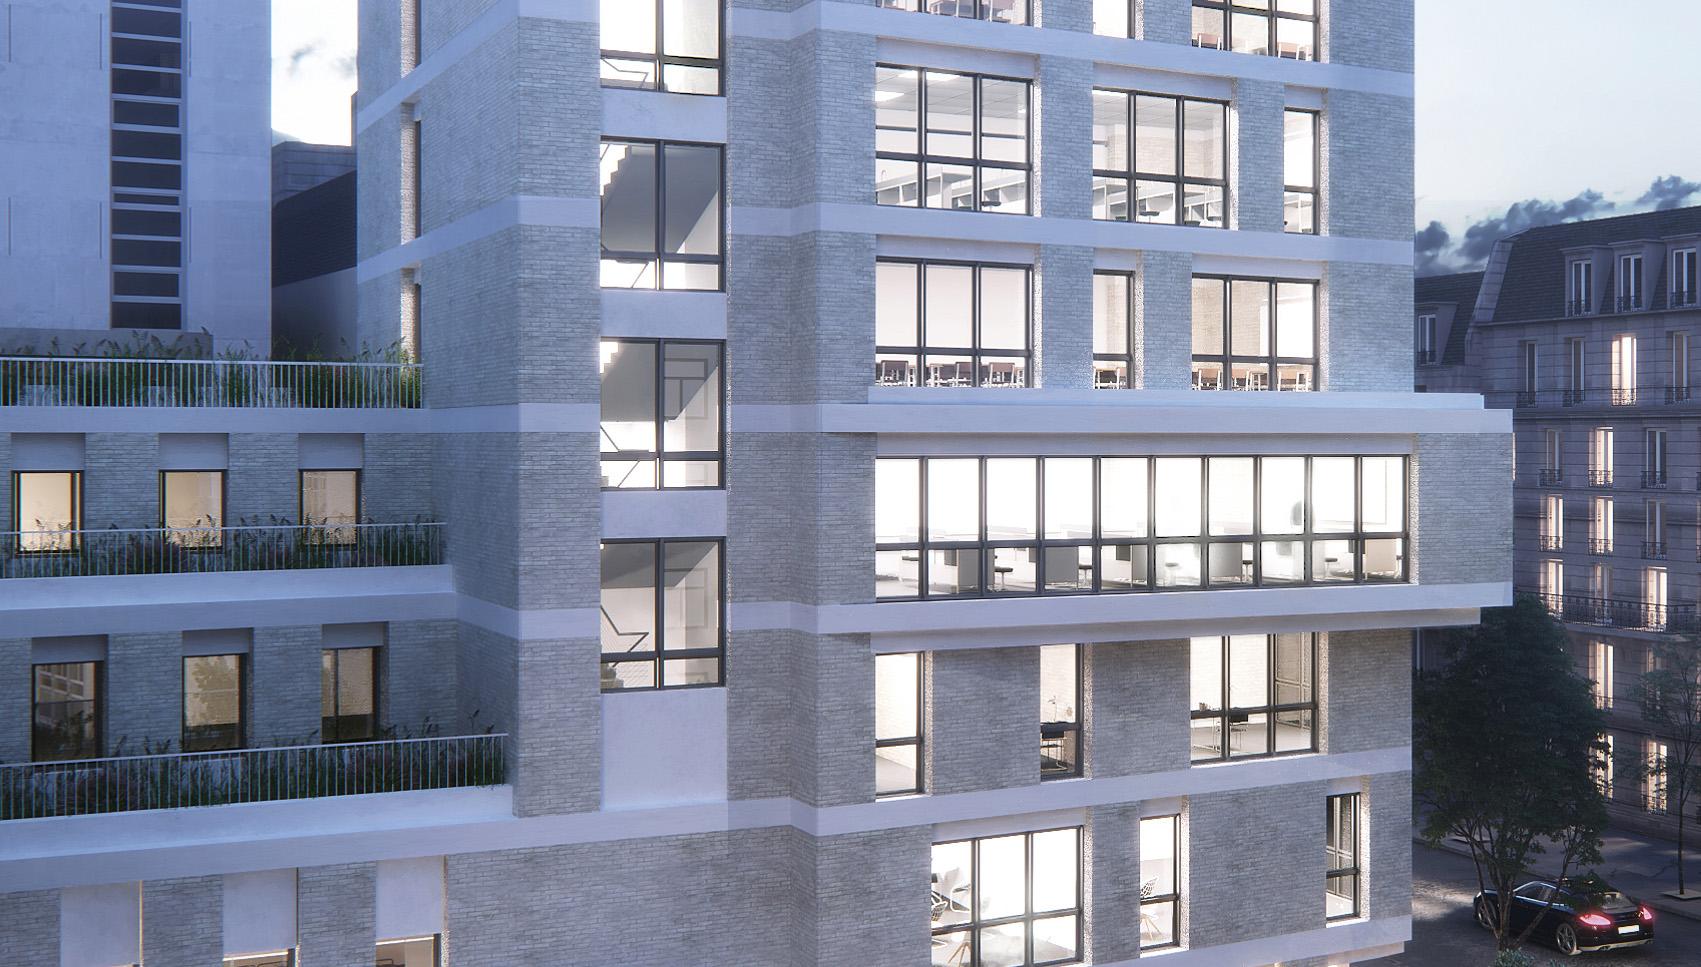 Lyc enotre damedes oiseaux 2o16 2o2o bien urbain for Architecture contemporaine definition